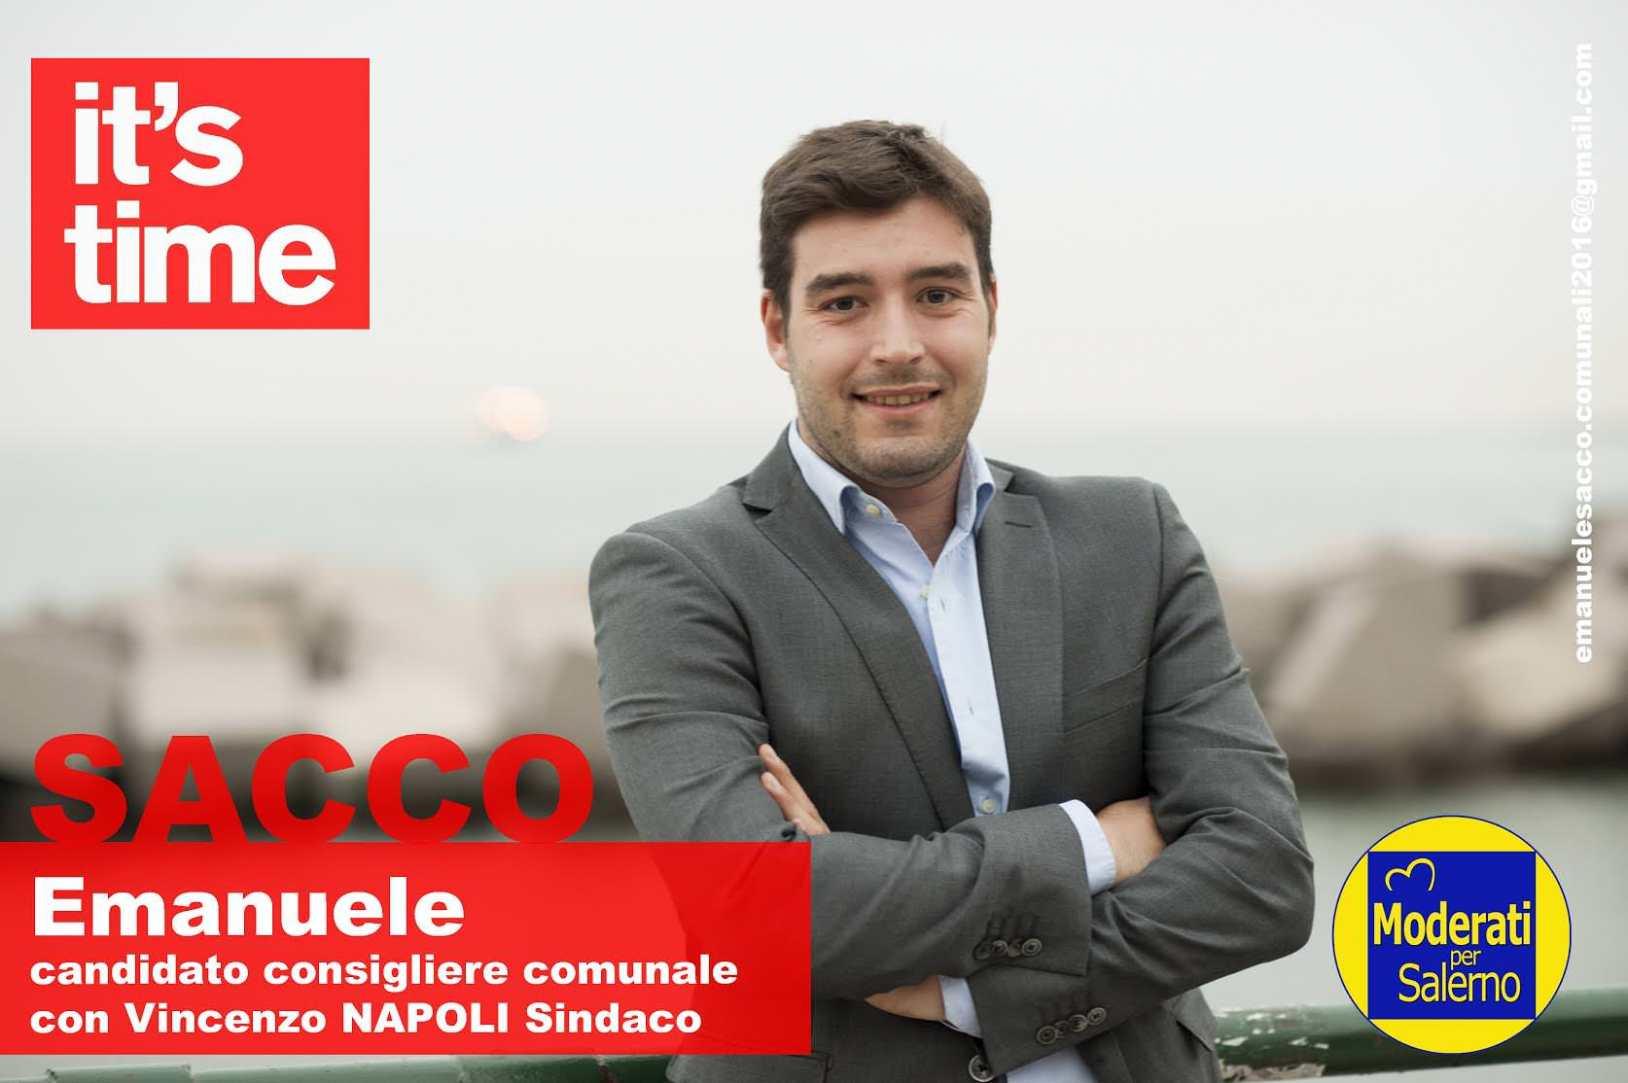 emanuelesaccocomunali2016